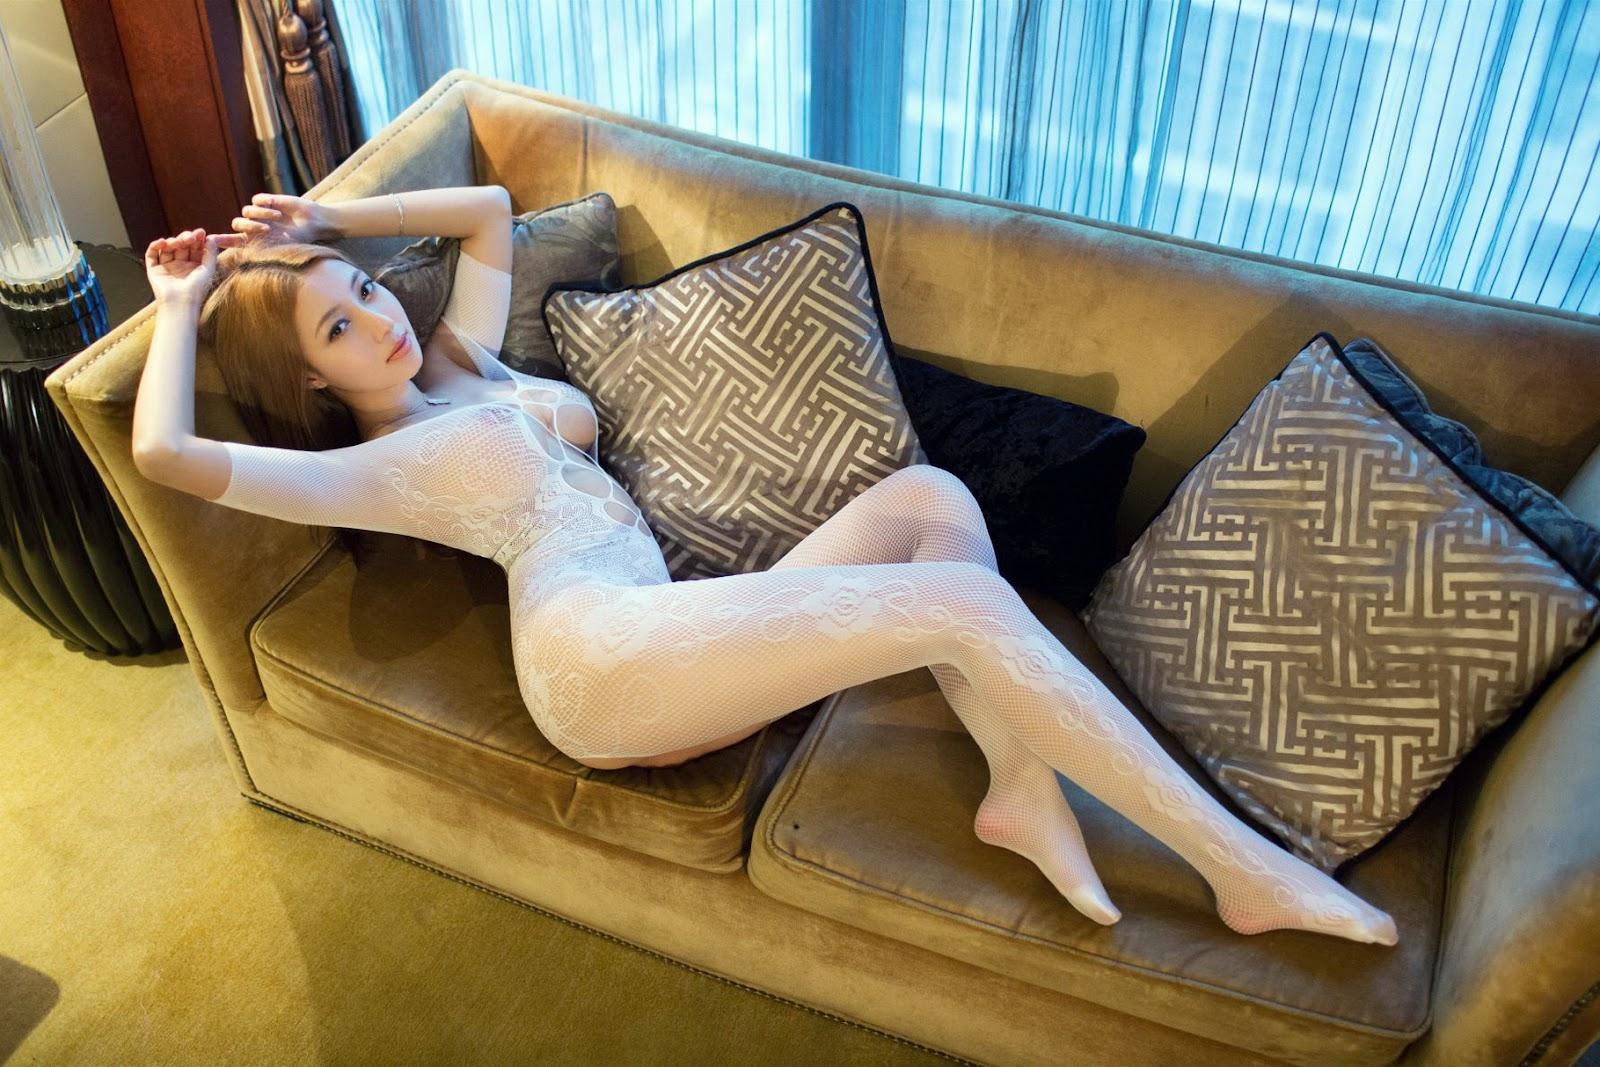 48%2B%252817%2529 - Sexy Girl Nude TUIGIRL NO.48 Model